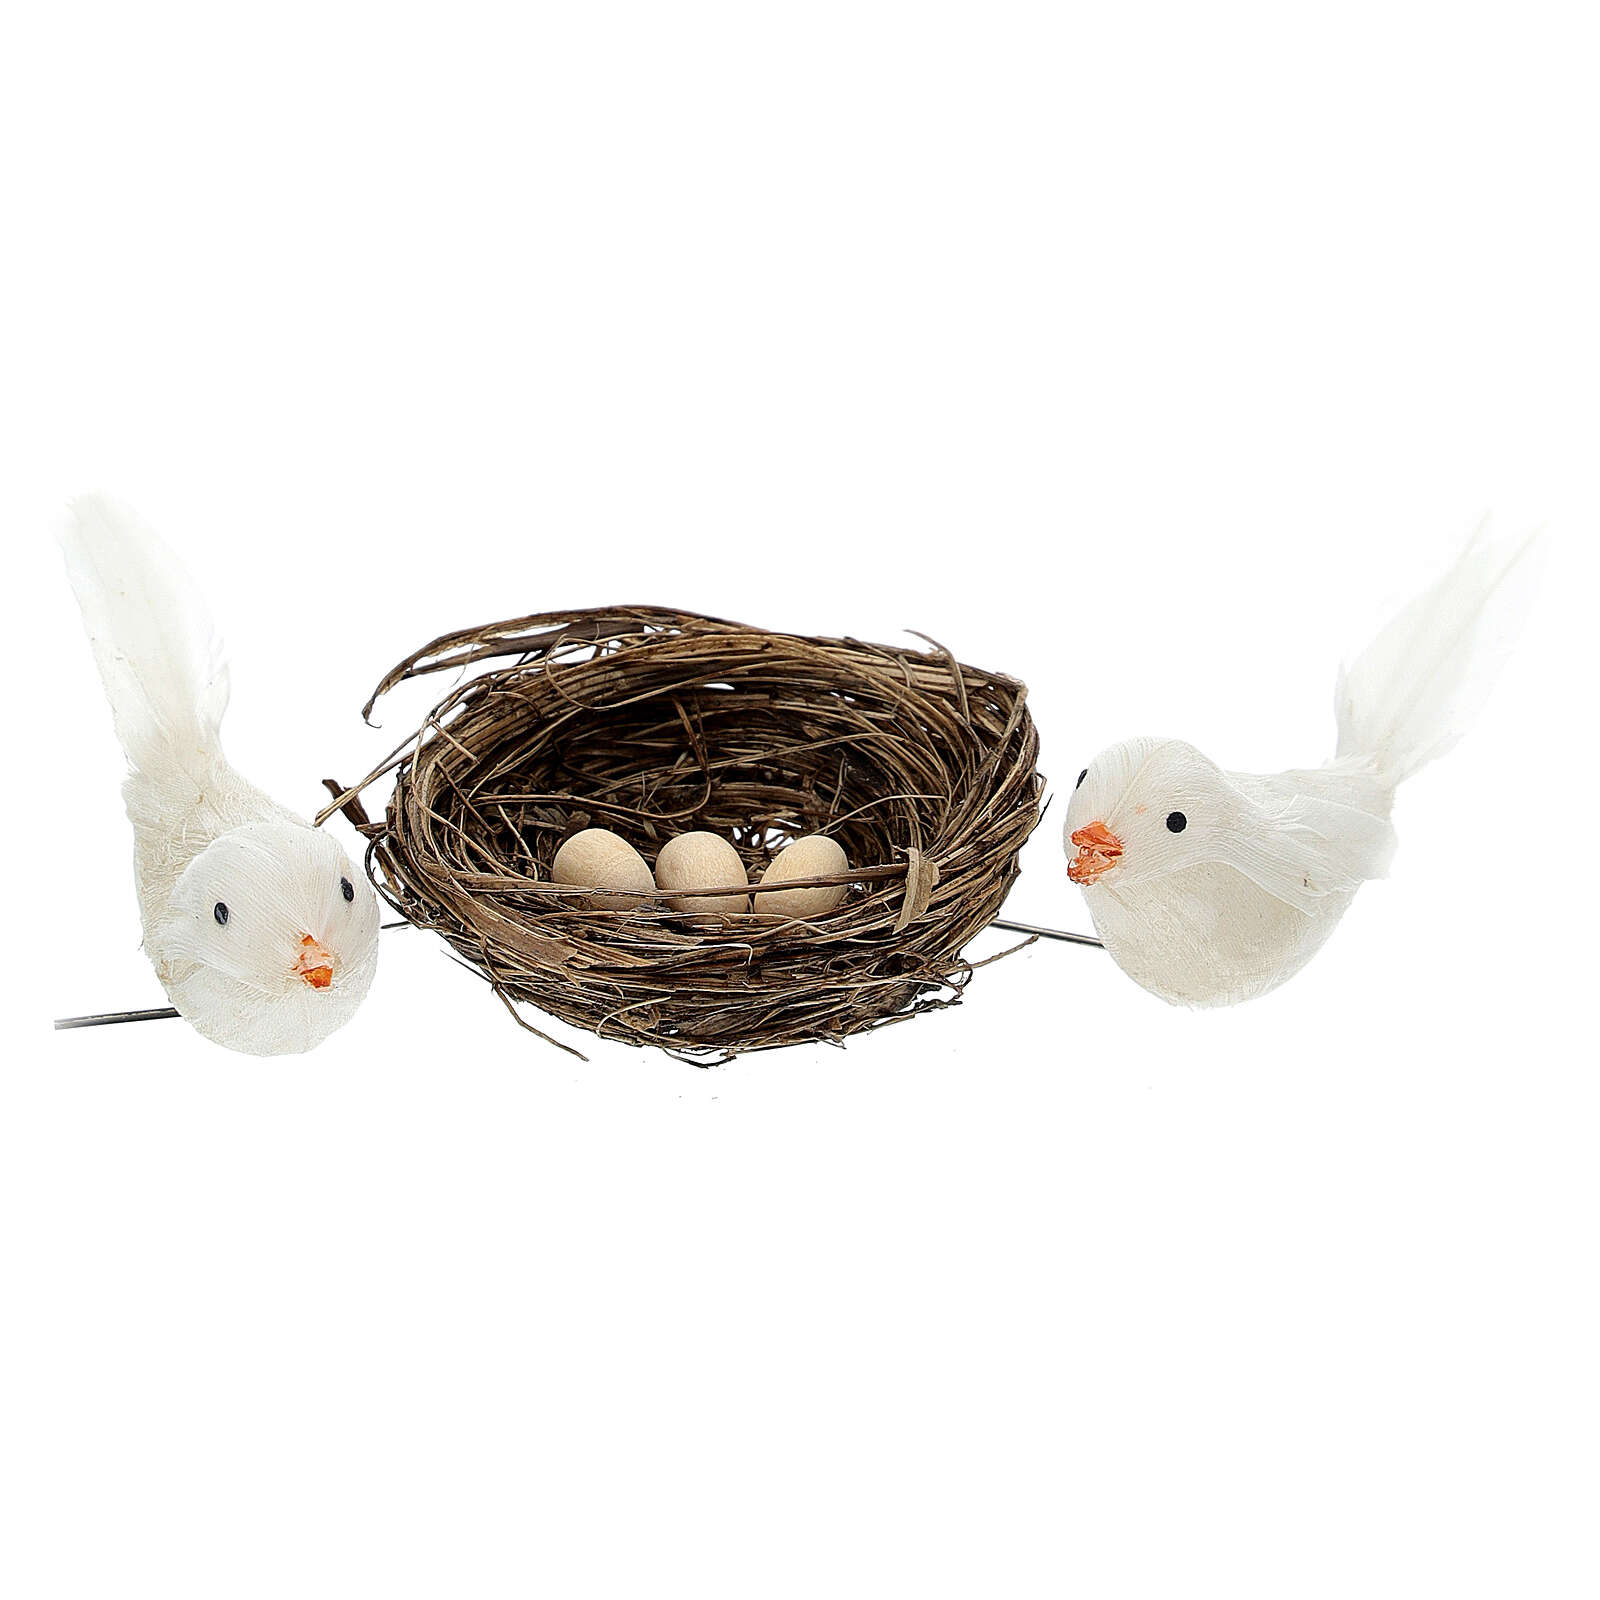 2 coloured birds with nest and eggs Nativity scene 10 cm 3